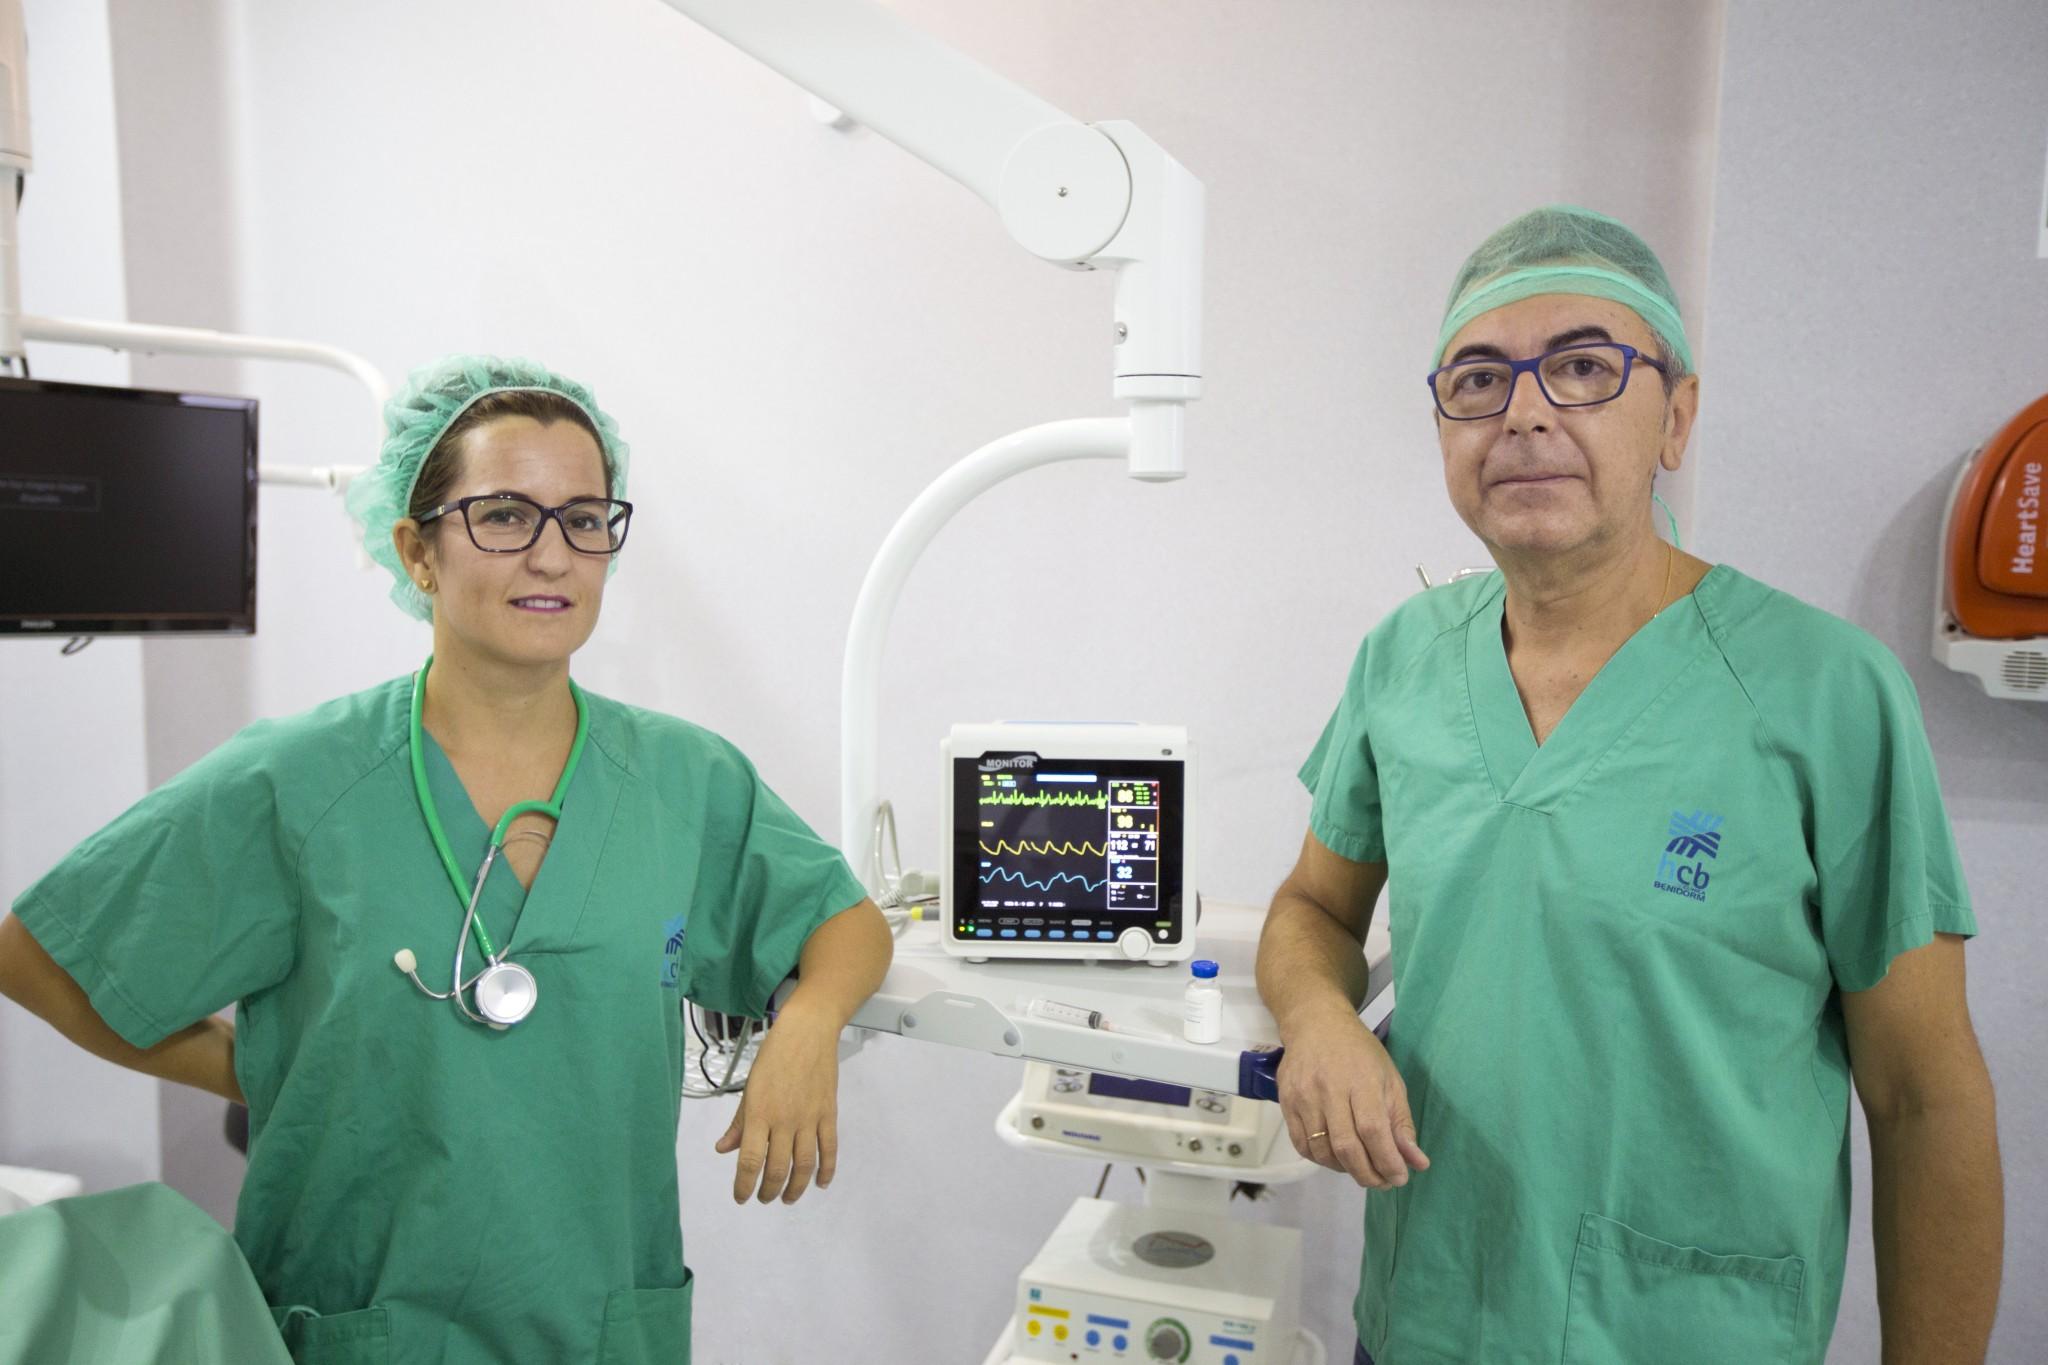 anestesiólogos - anaesthetist - Jaime Masot y Paula Arrarte,